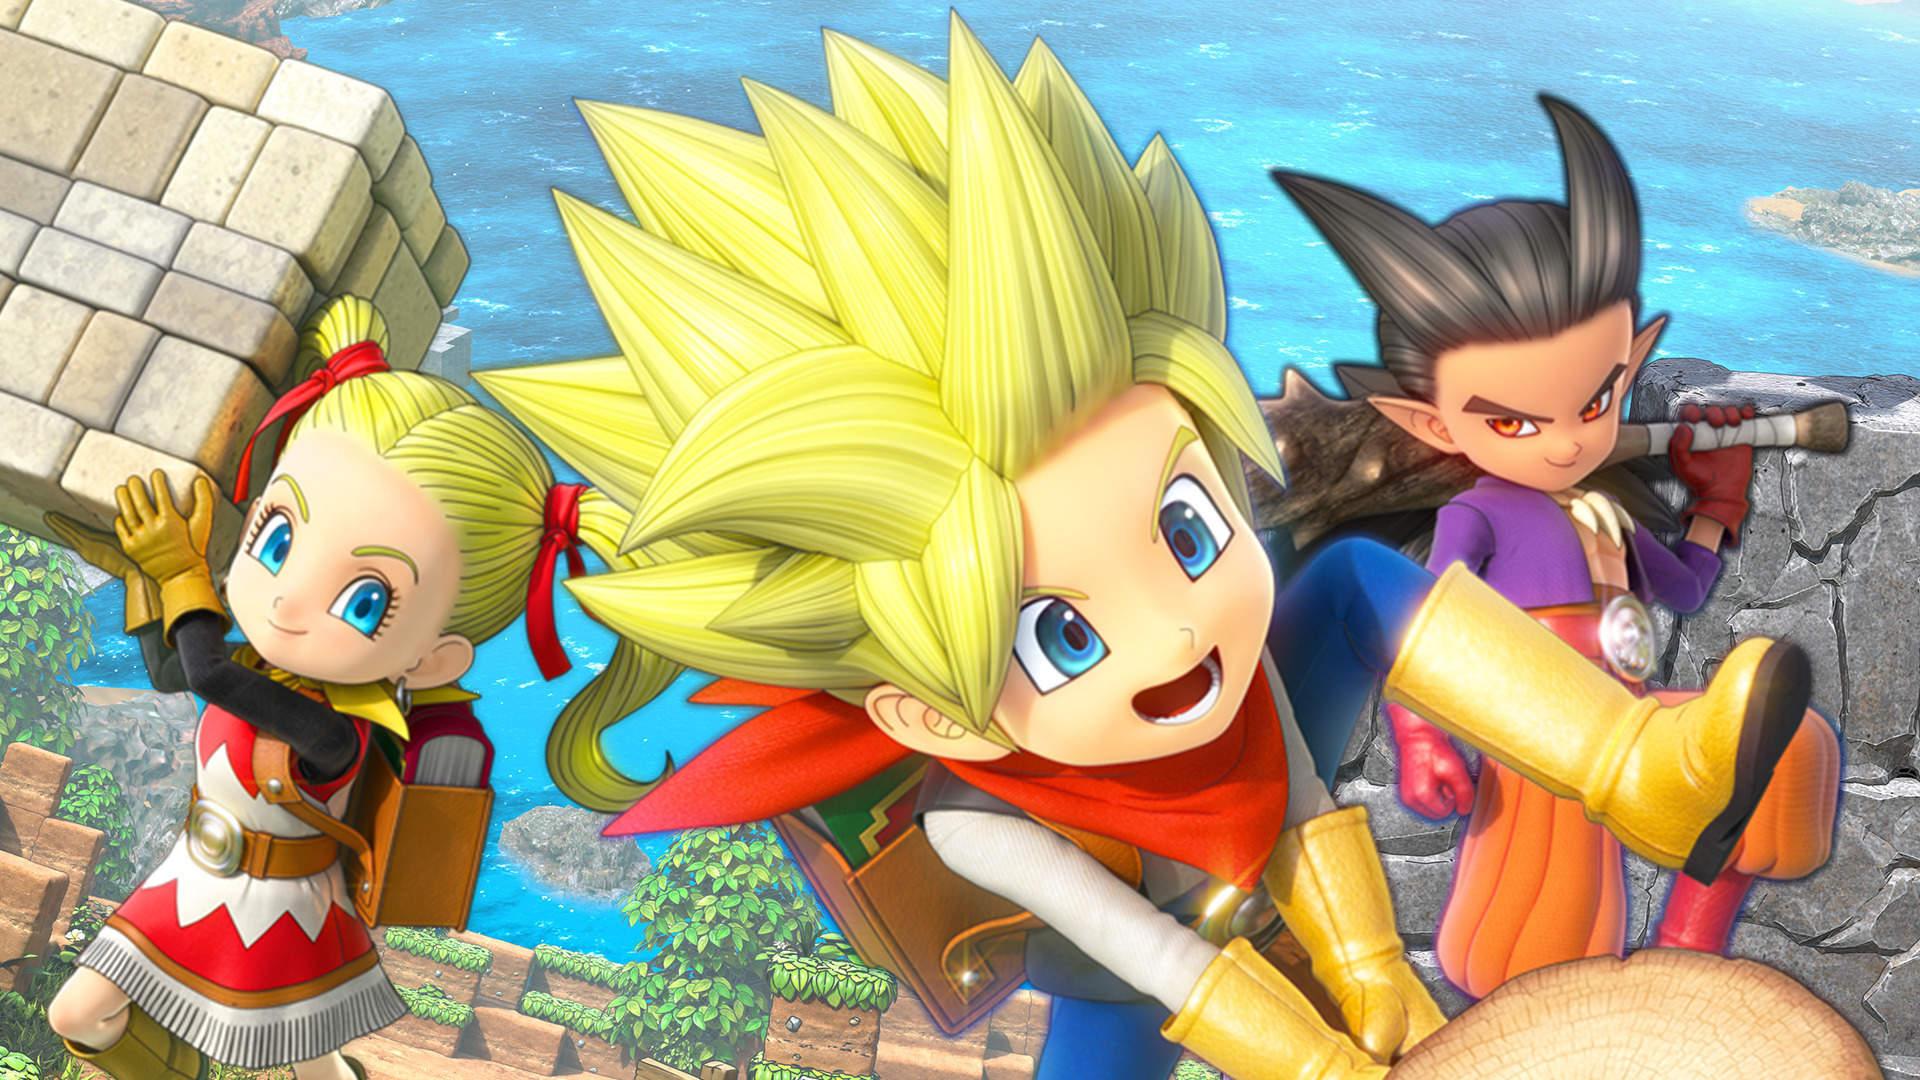 Демо версия Dragon Quest Builders 2 станет доступна 27 июня